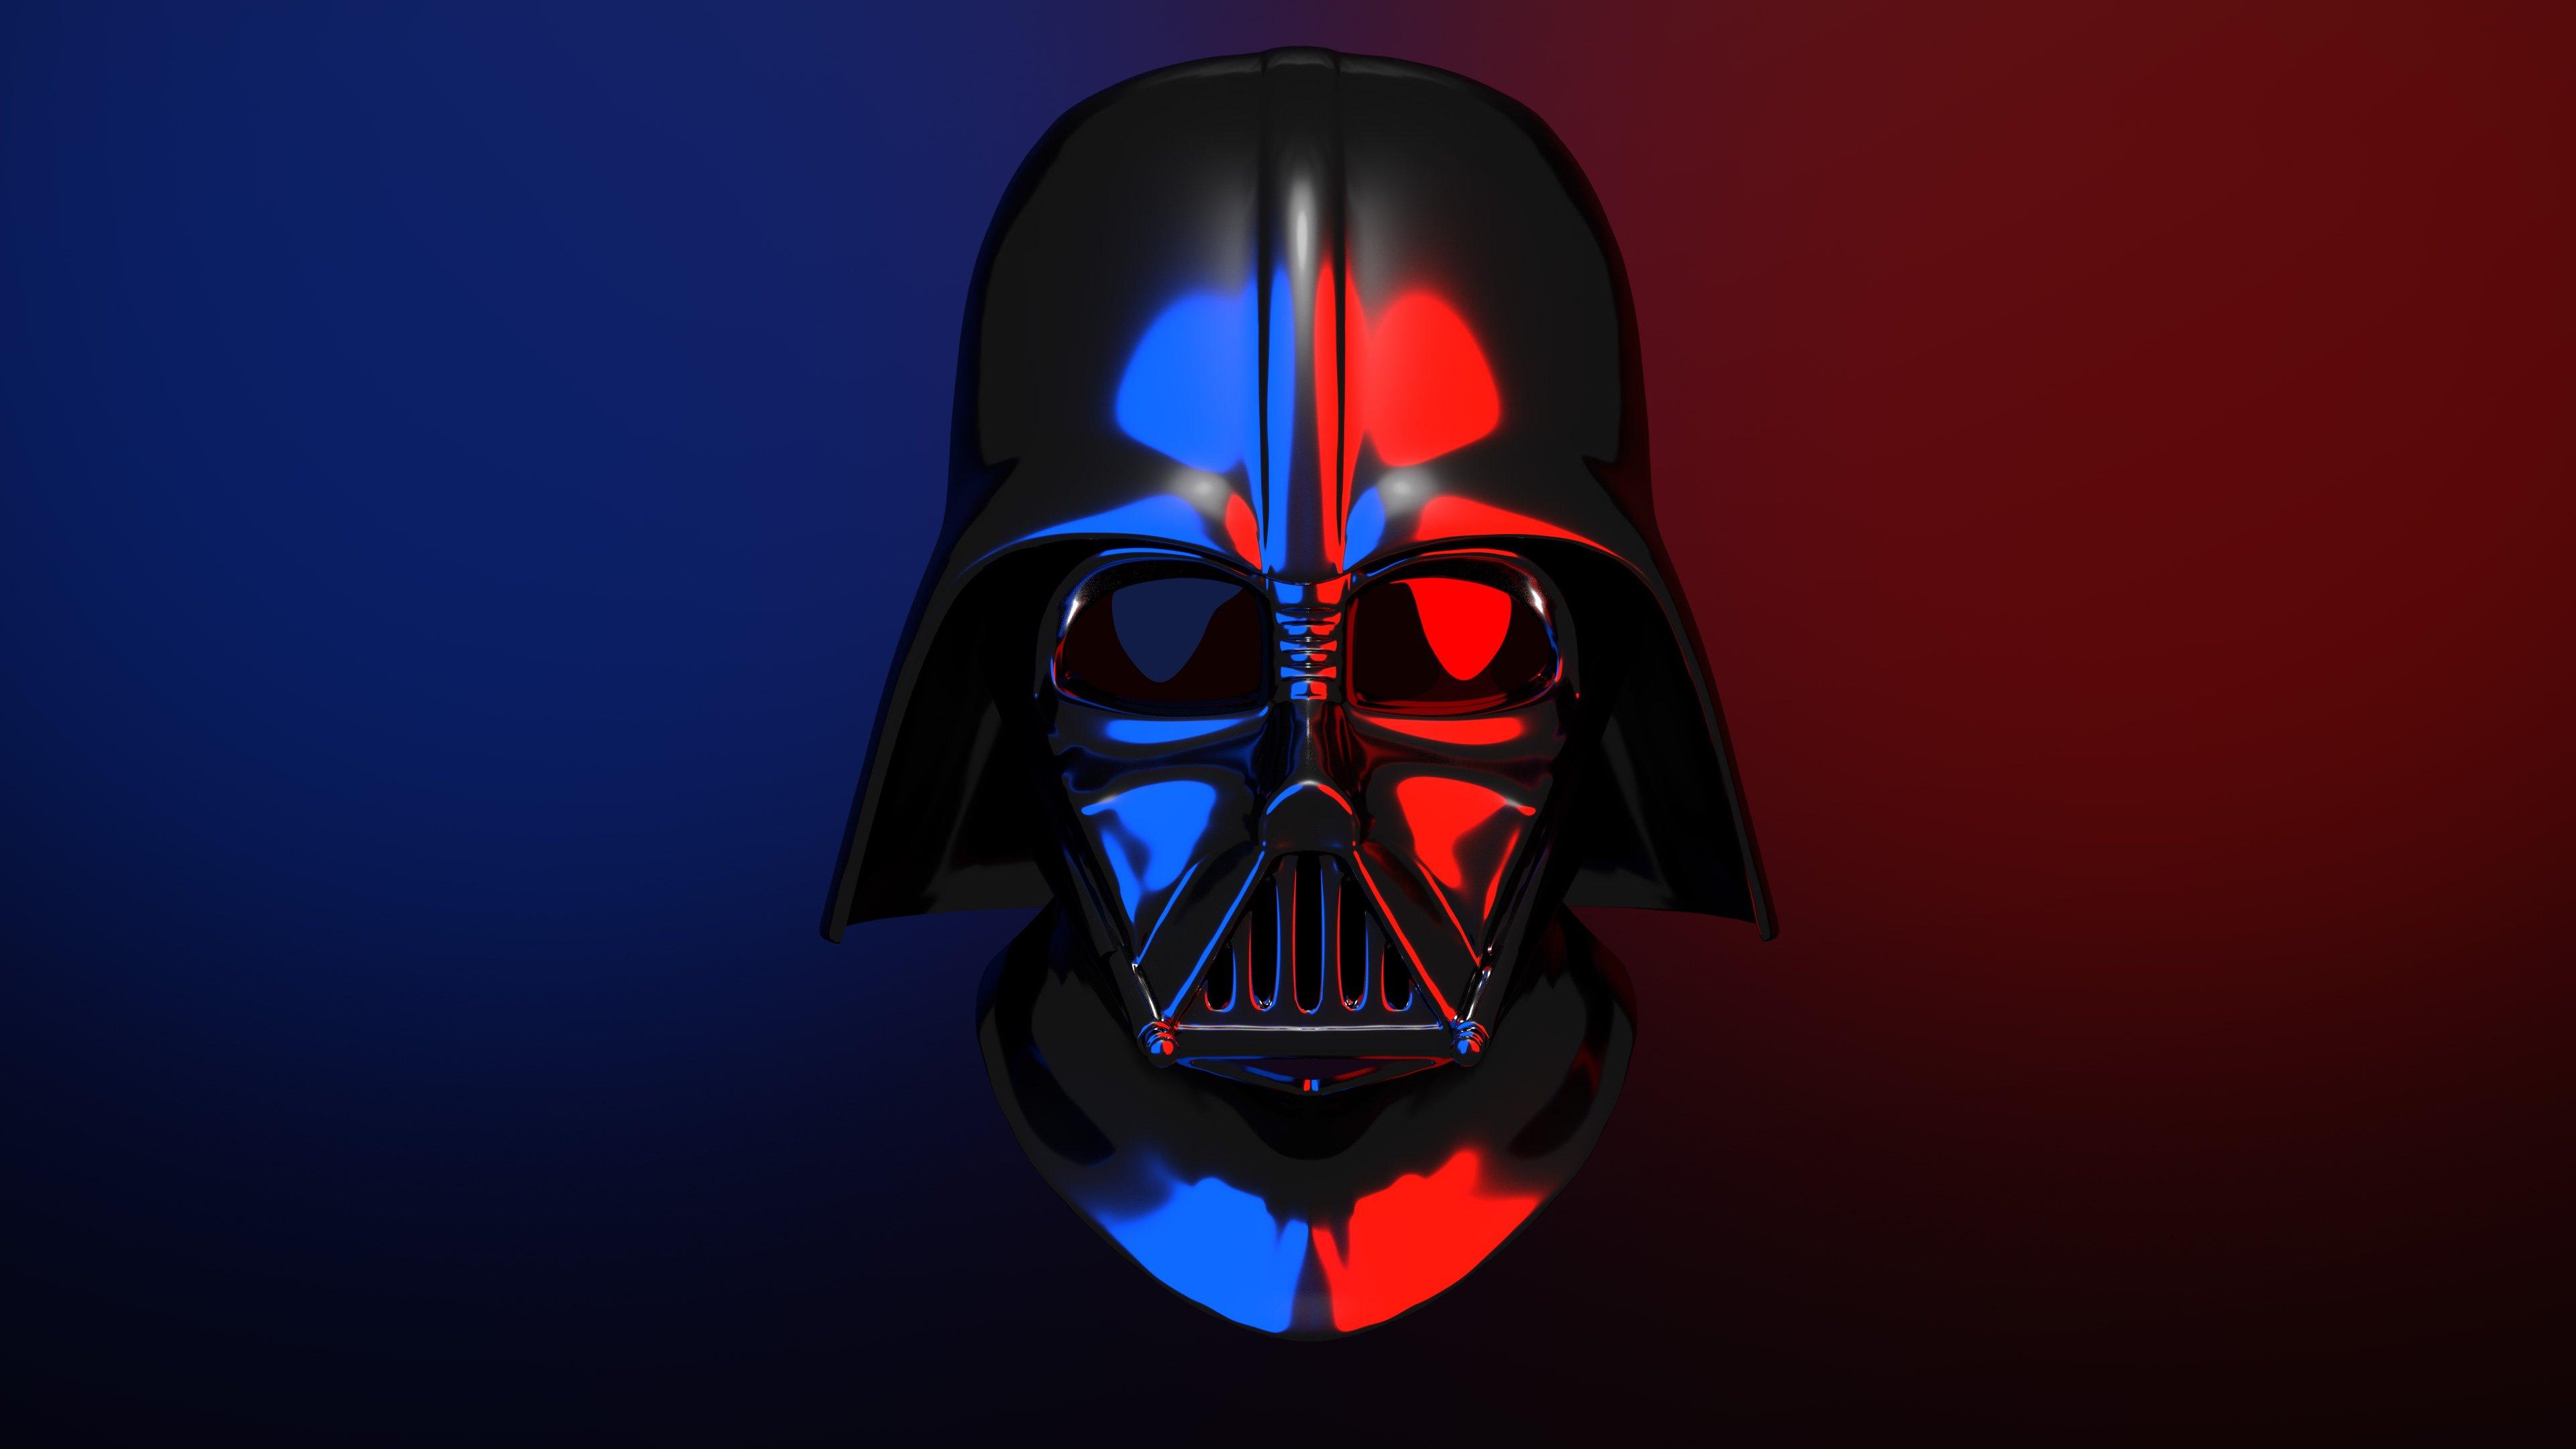 Darth Vader Wallpaper 4K   KoLPaPer   Awesome HD Wallpapers 3840x2160